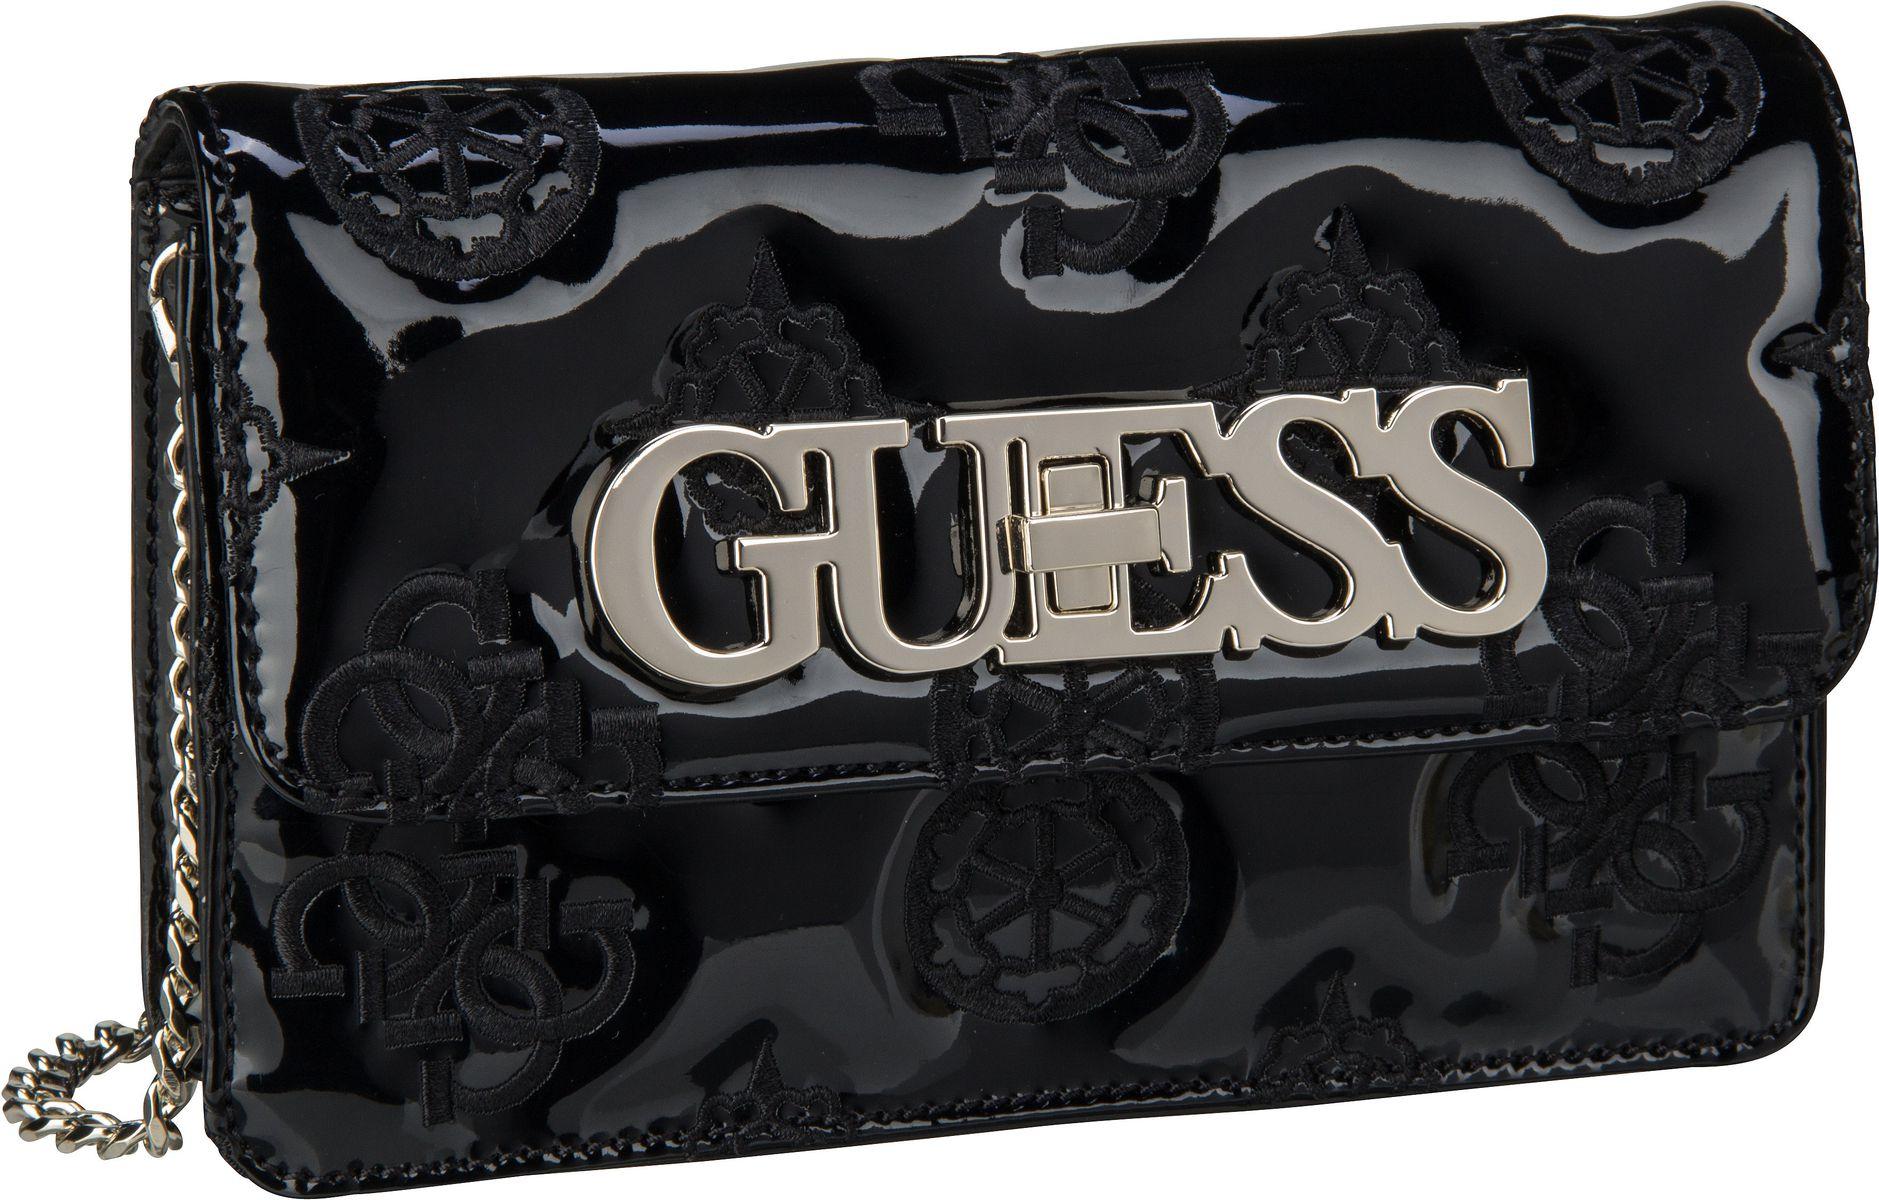 Clutches - Guess Abendtasche Clutch Guess Chic Mini Crossbody Flap Black  - Onlineshop Taschenkaufhaus